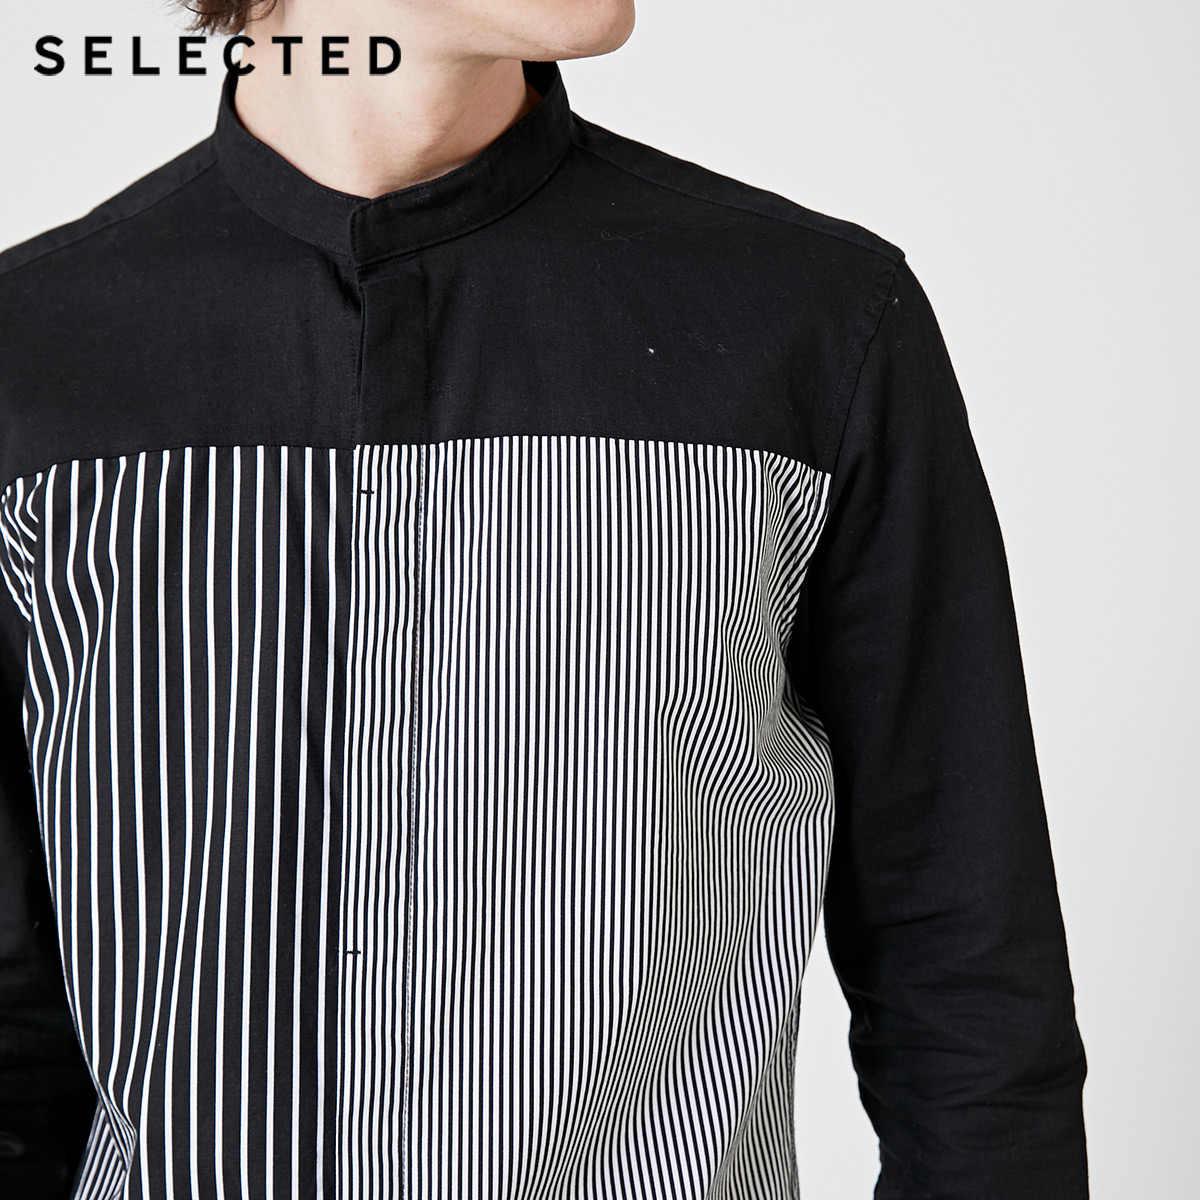 SELECTED 남성 슬림 피트면 & 린넨 스트 라이프 긴팔 셔츠 S | 419105559